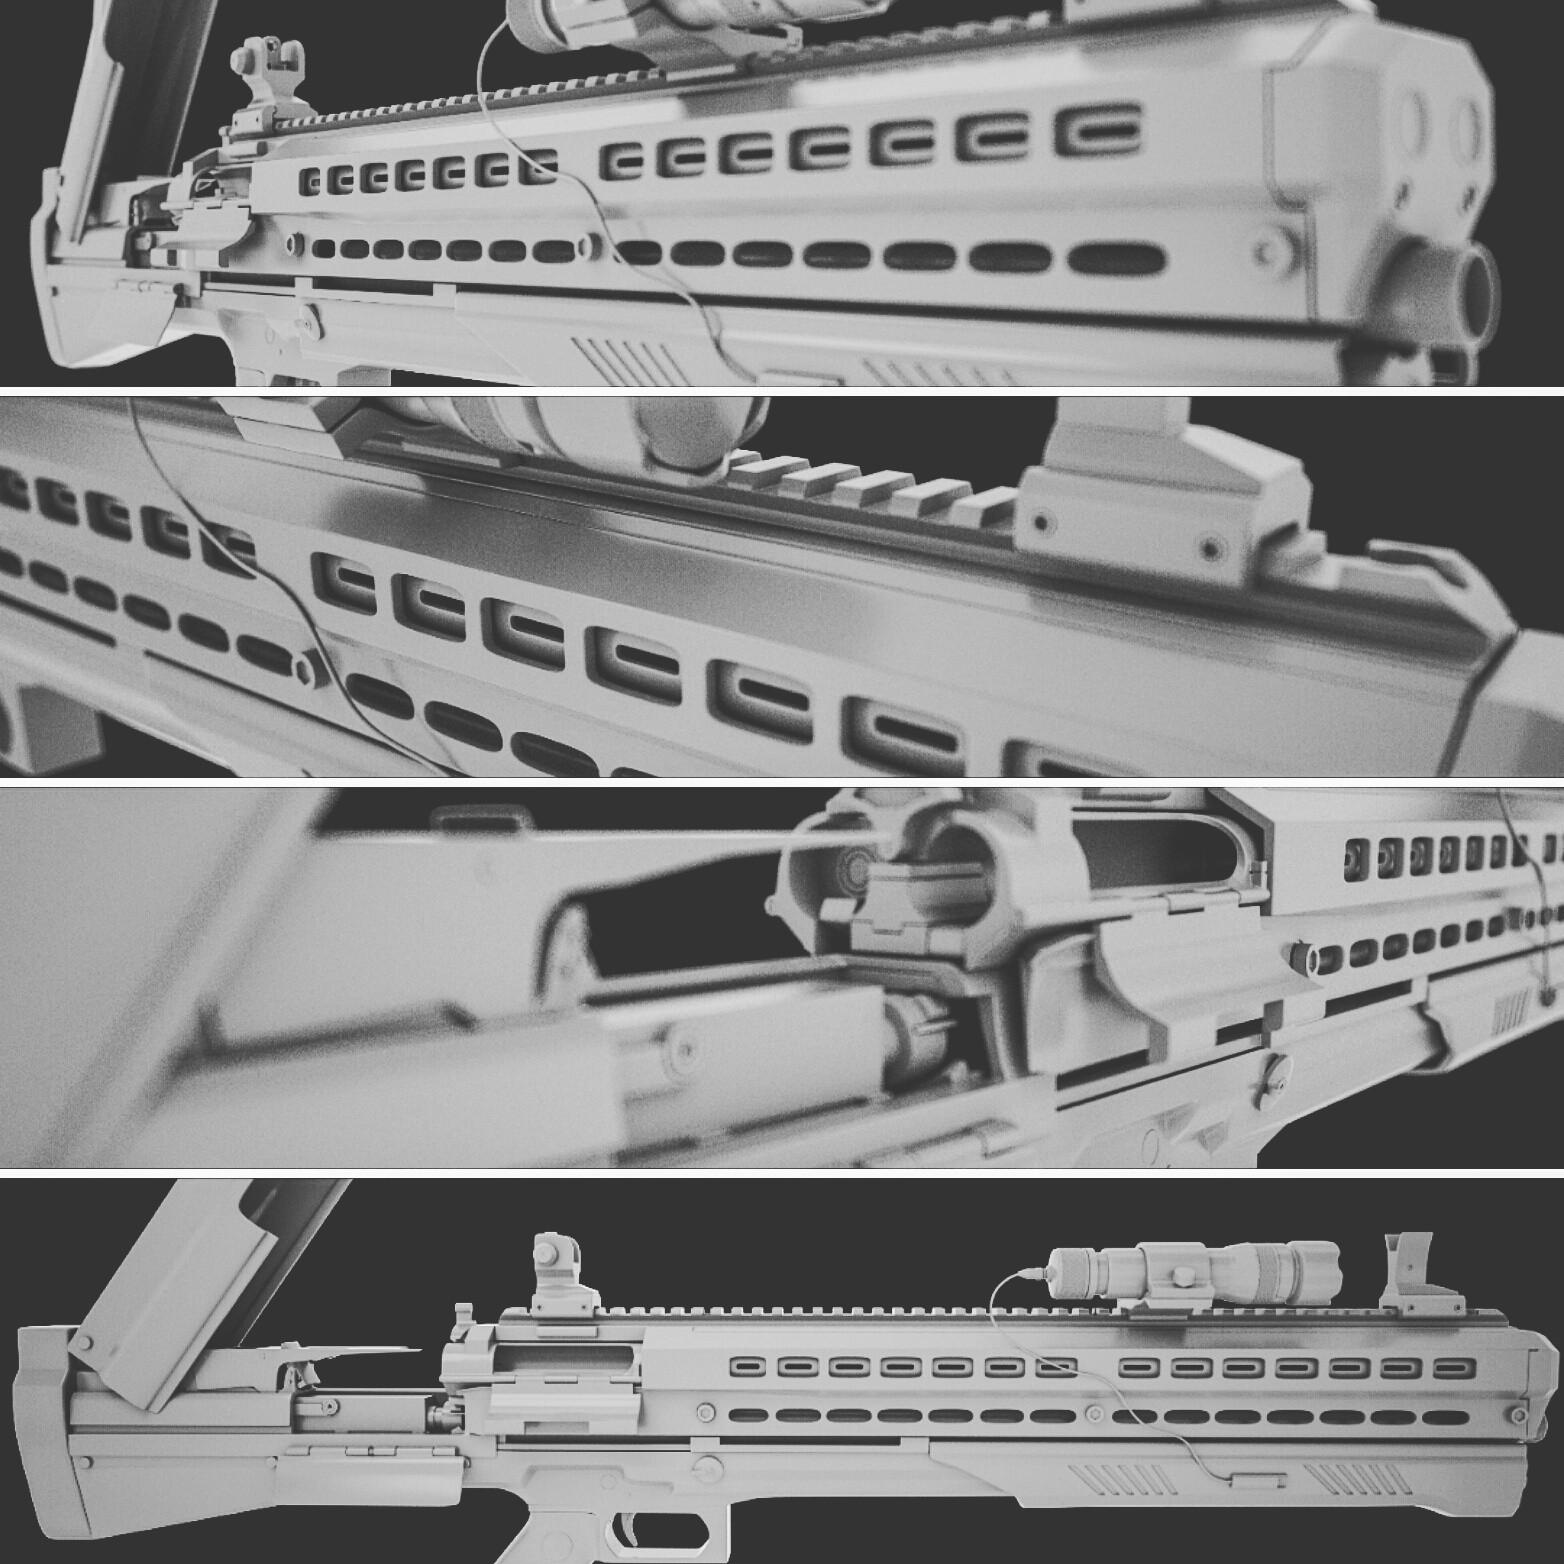 UTAS UTS-15 - Shotgun